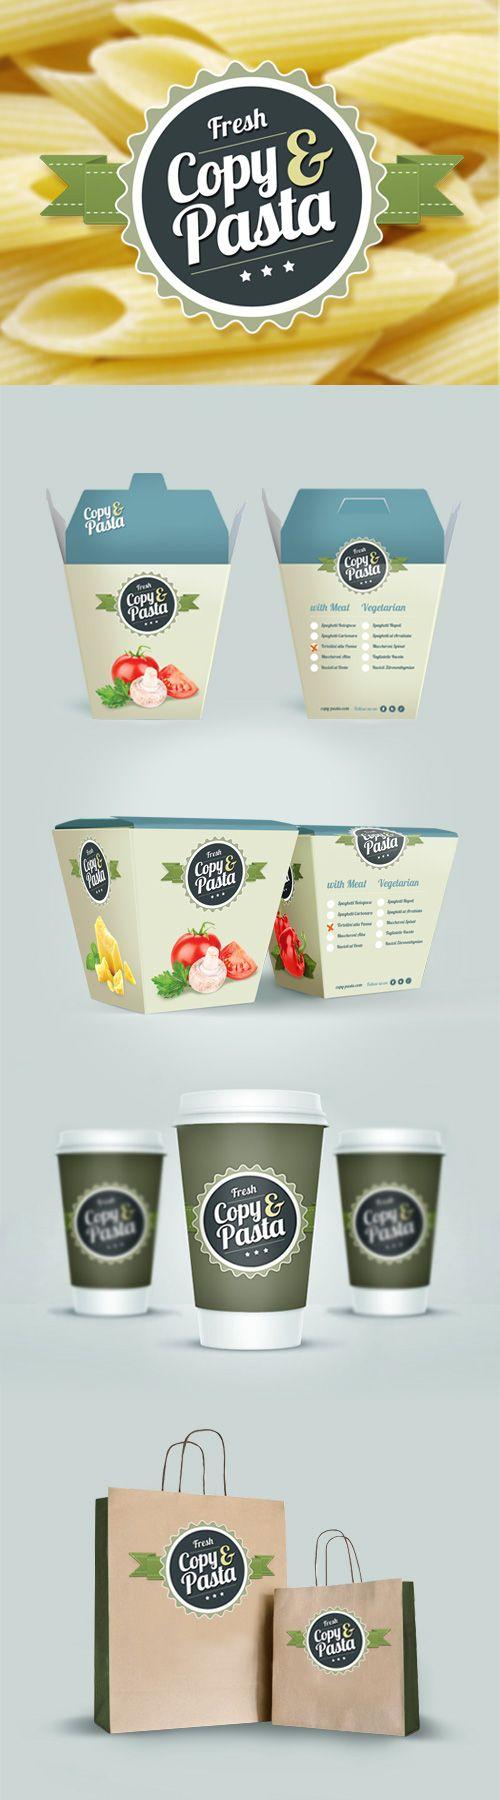 Copy & Pasta #identity #packaging #branding PD